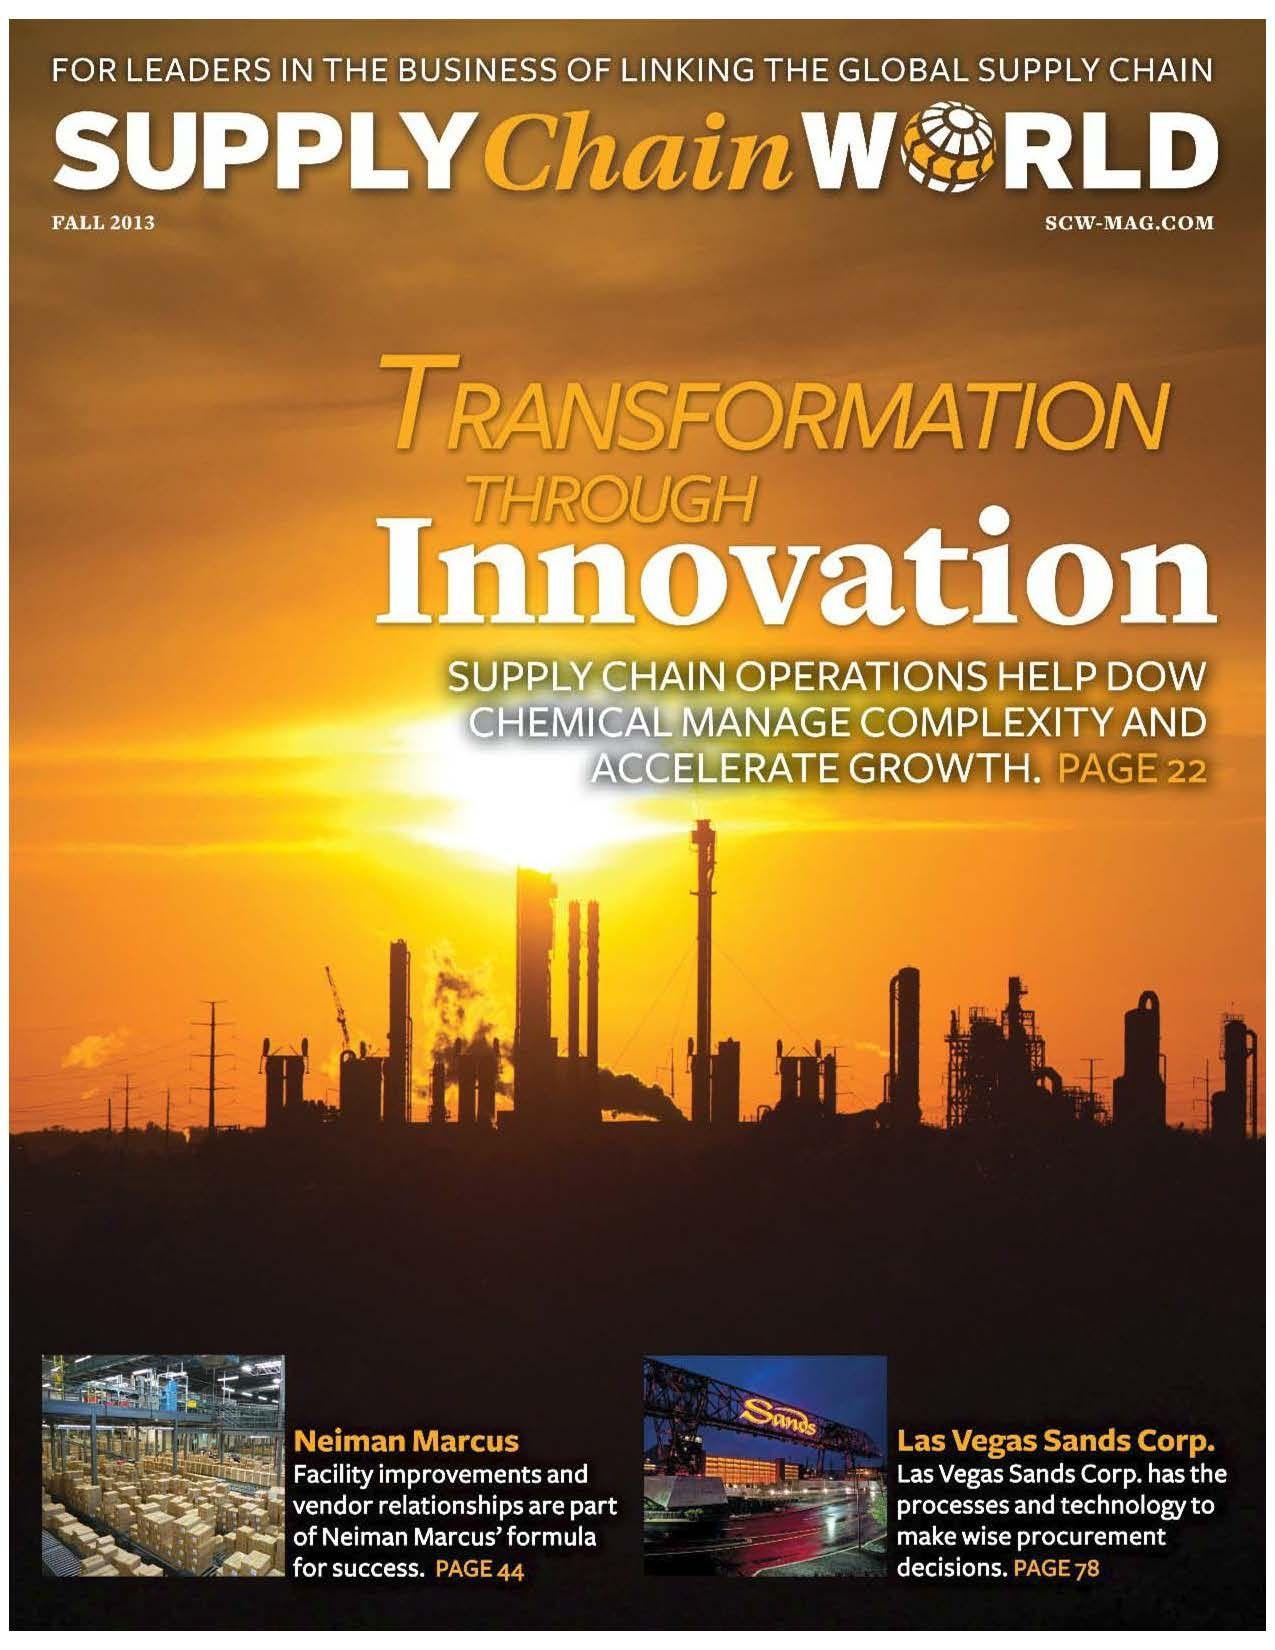 https://asoft8285.accrisoft.com/biotronics/clientuploads/BioTronics/2013 Symposium PDFs/Supply Chain World Fall 2013.jpg